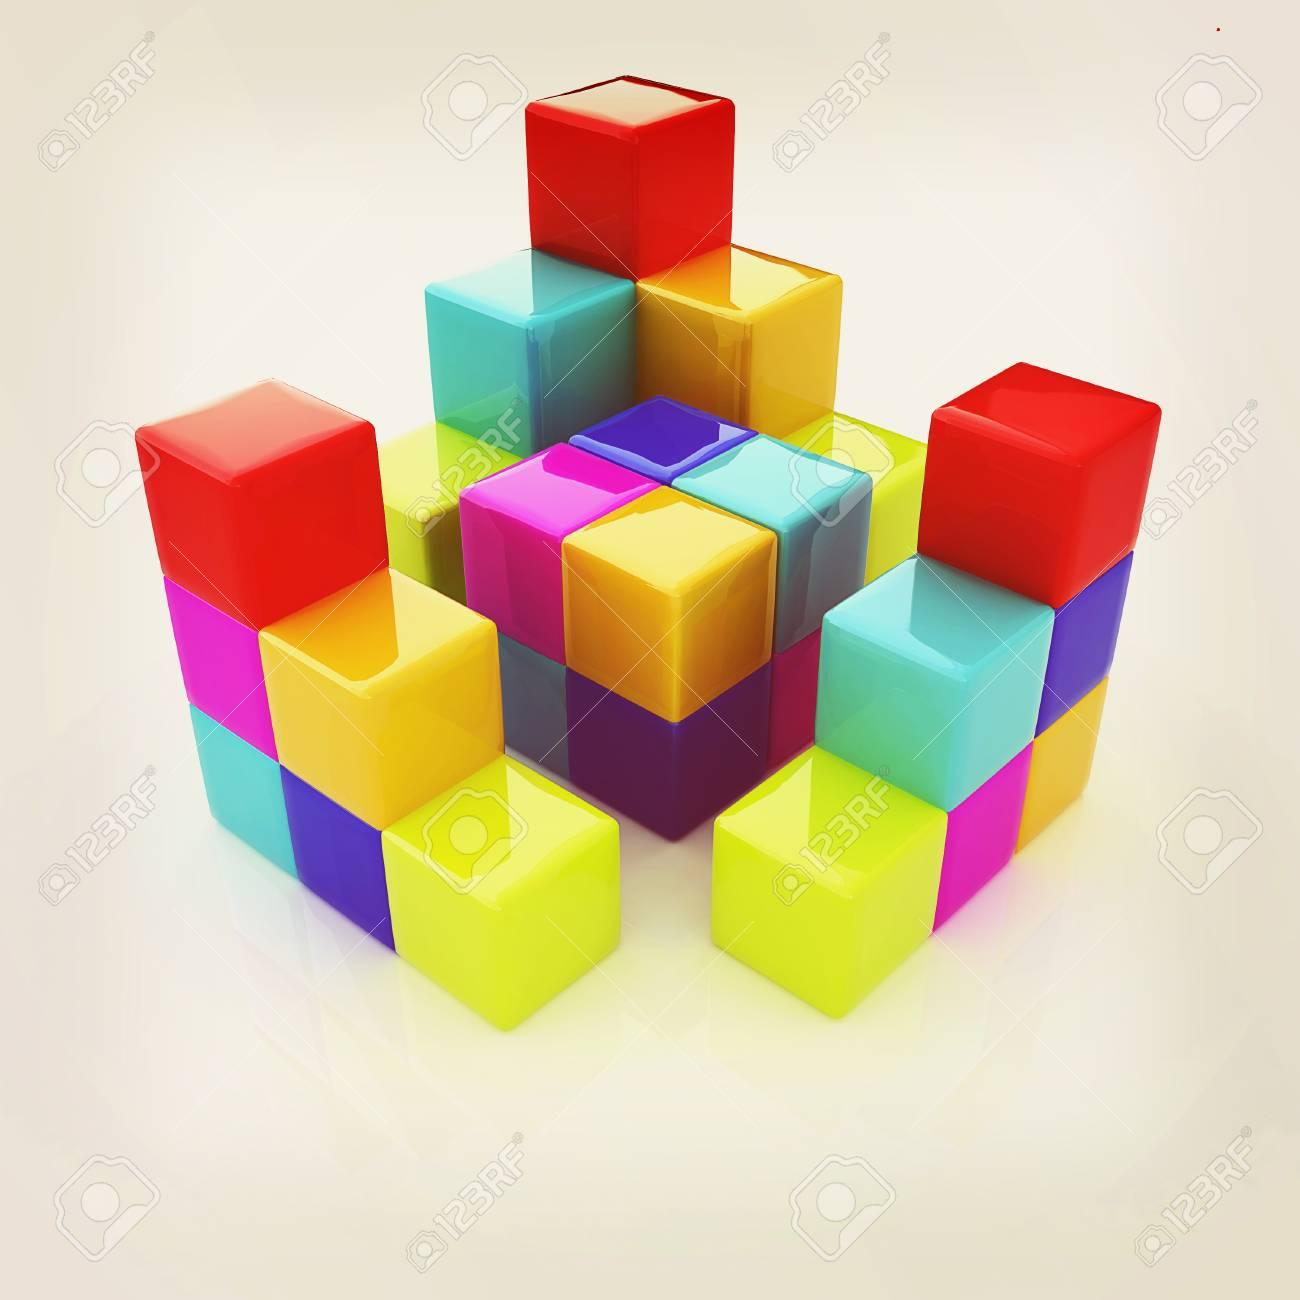 Colorful Block Diagram. 3D Illustration. Vintage Style. Stock Photo [ 1300 x 1300 Pixel ]